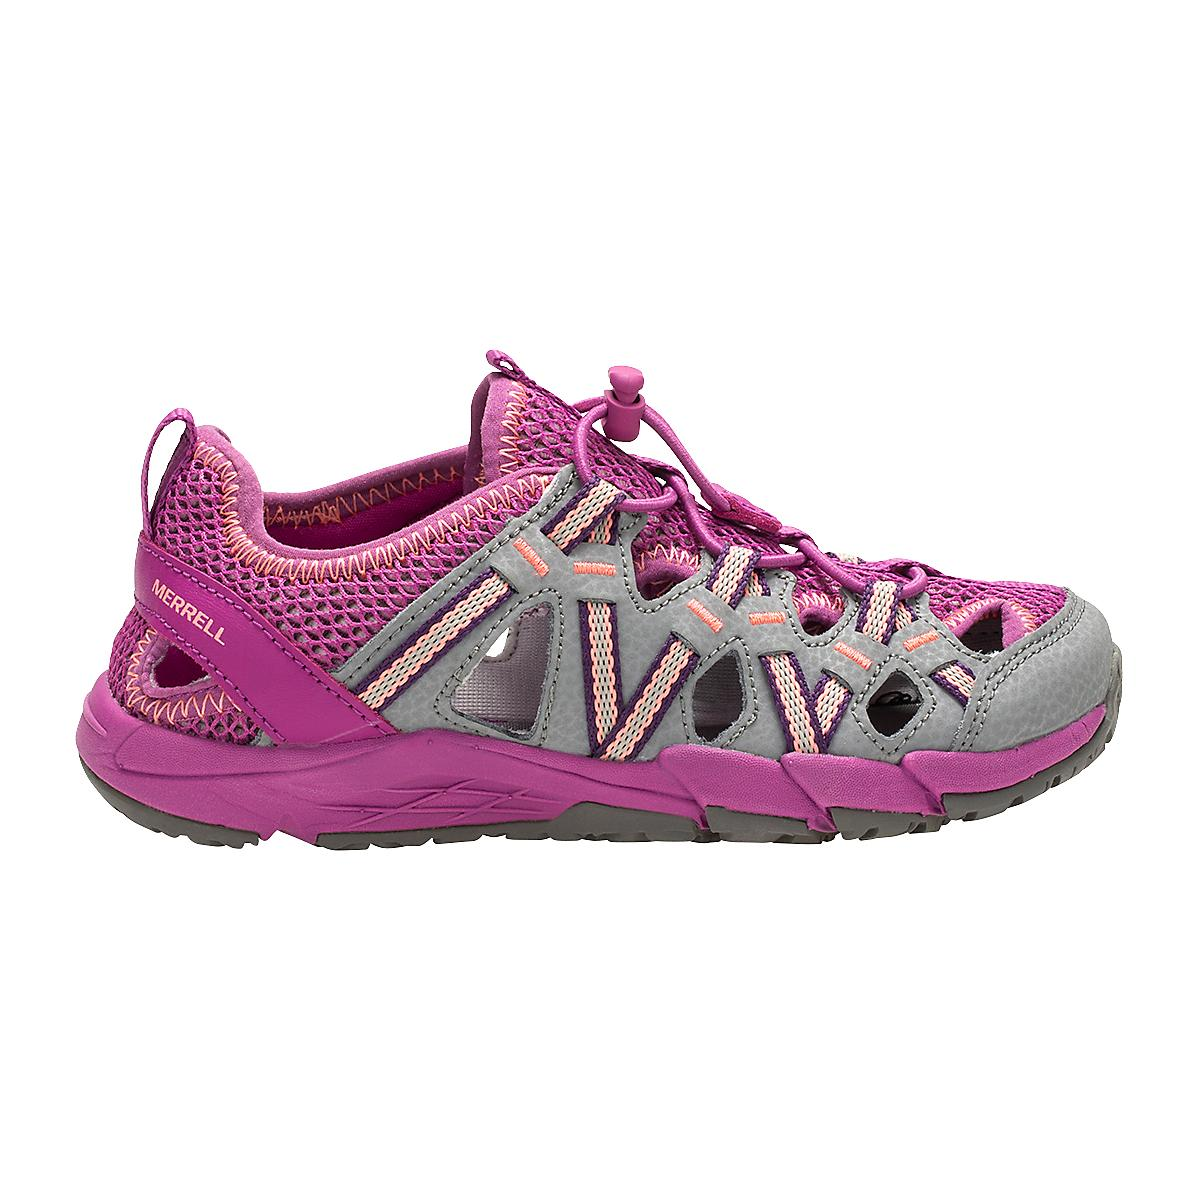 3f7b2cbc81b4 Kids Merrell Hydro Choprock Sandals Shoe